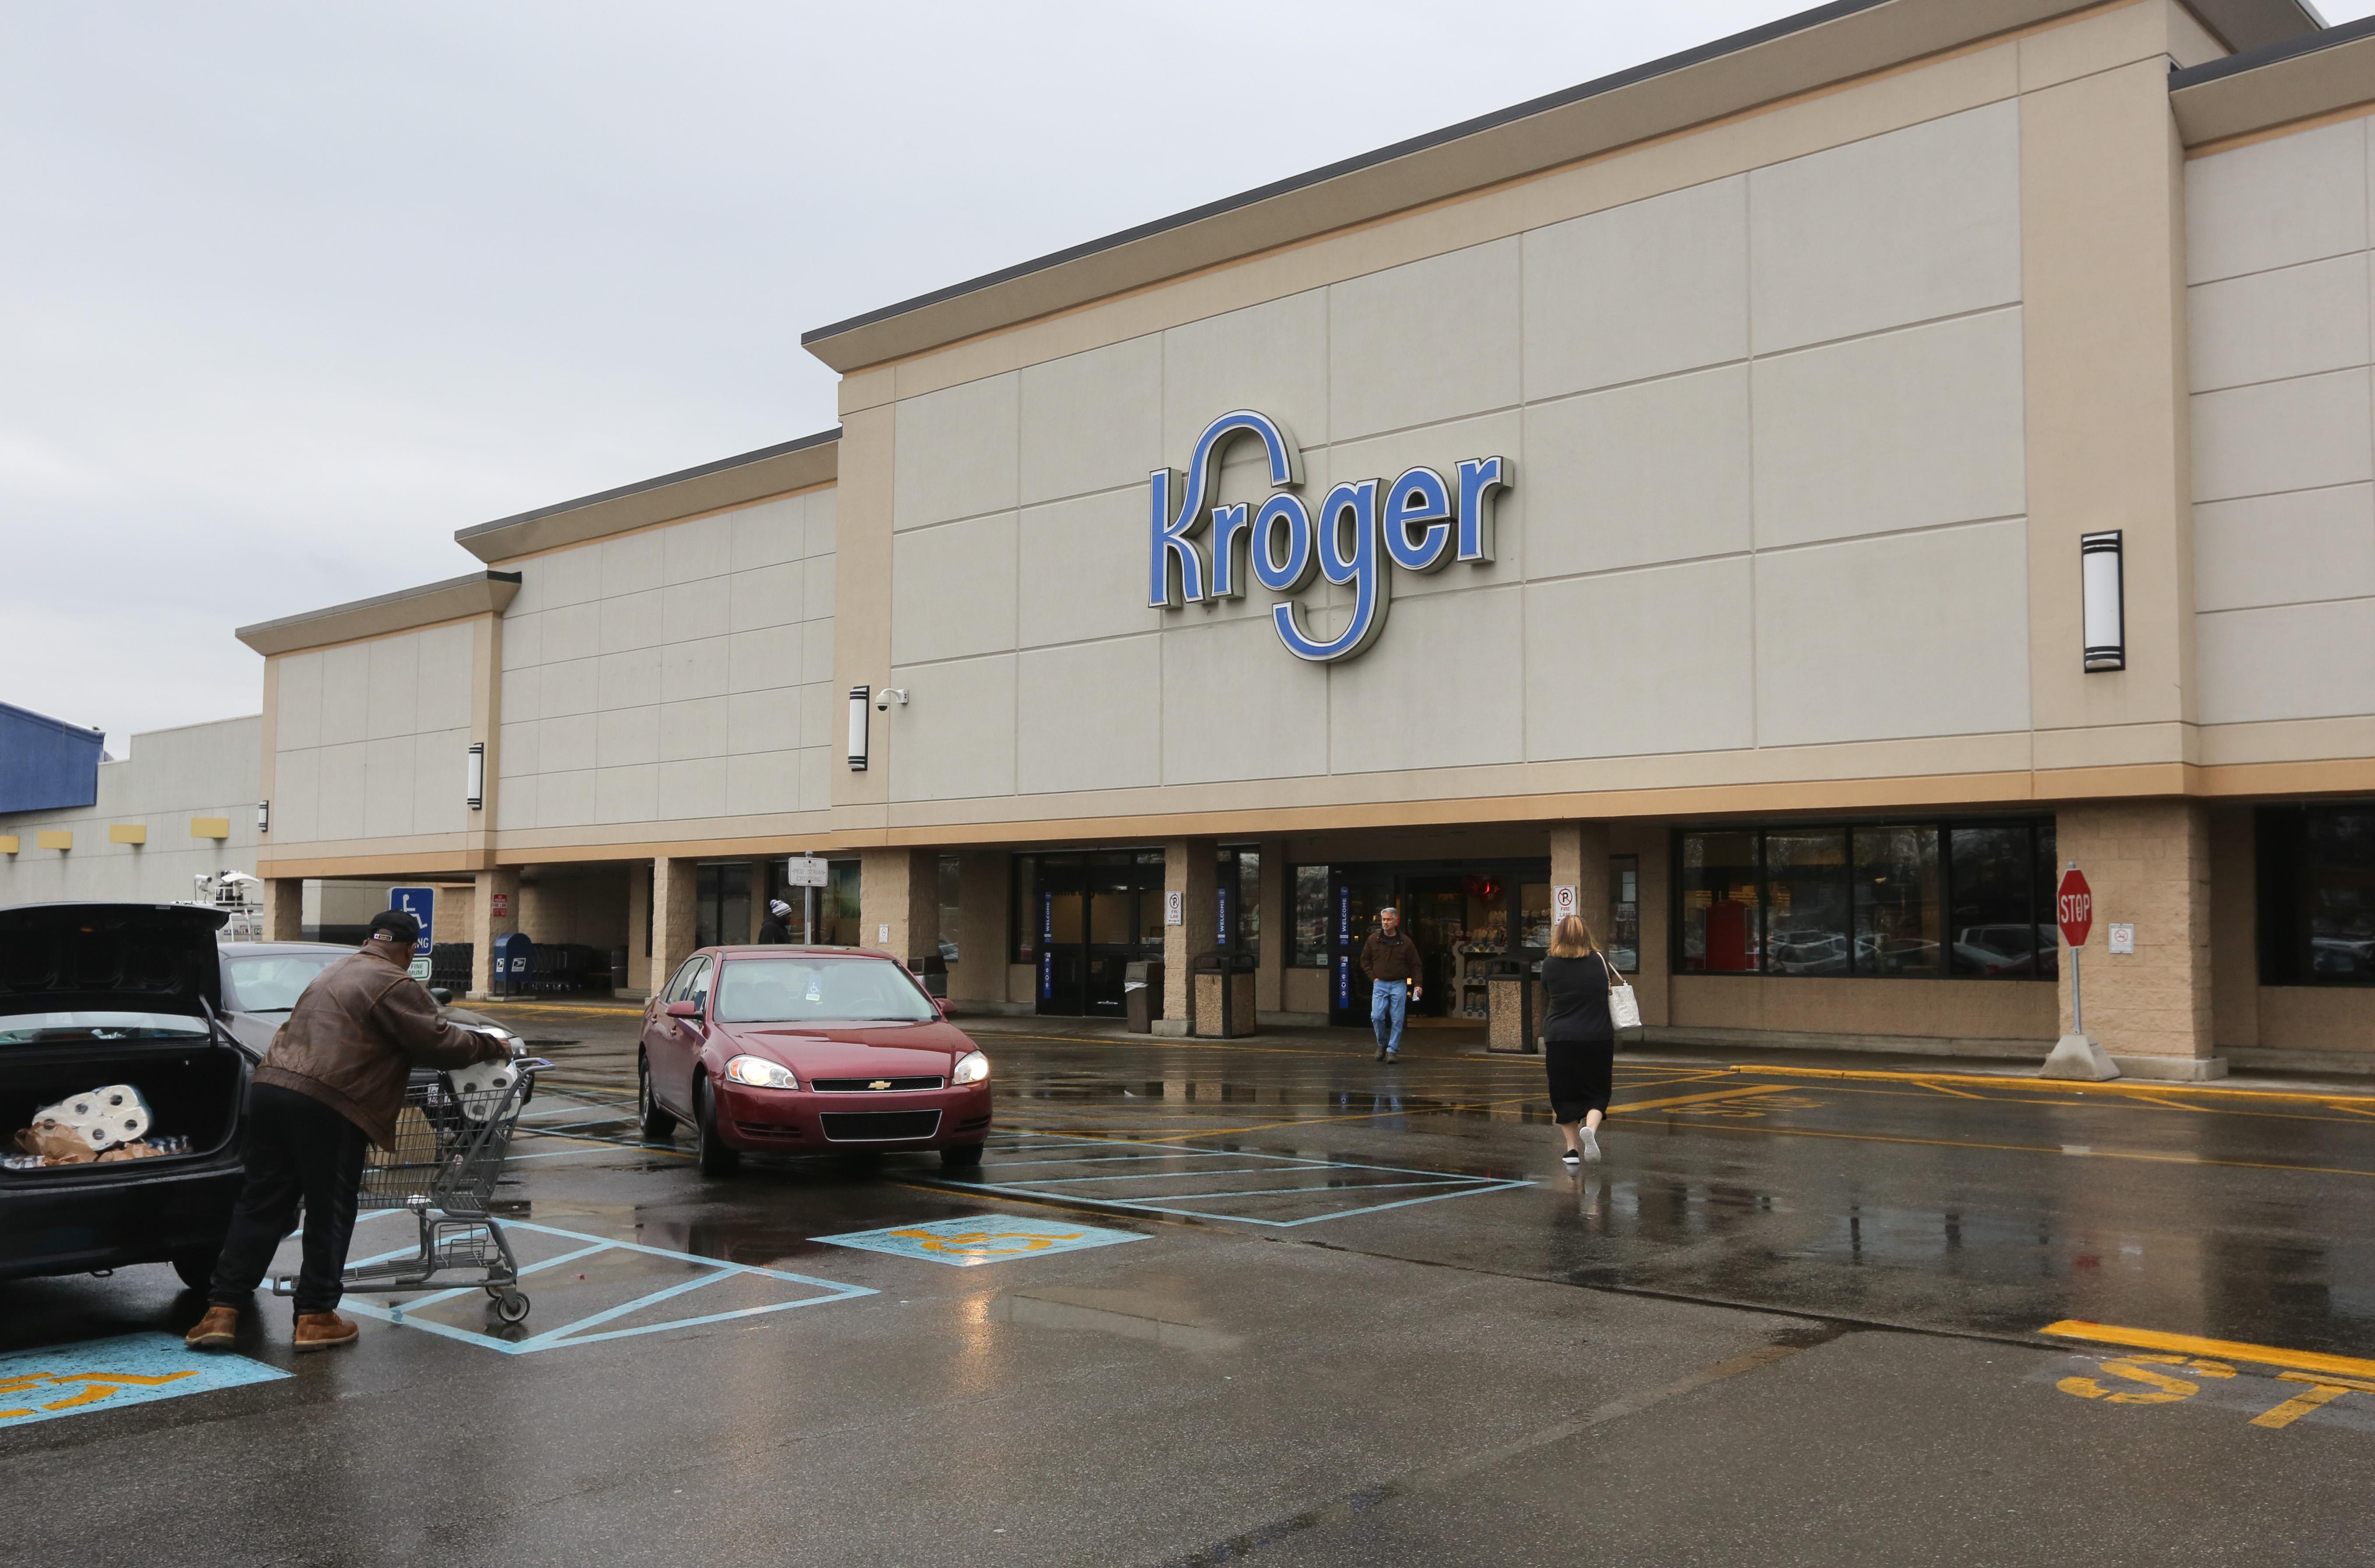 kroger gets go-ahead for bigger store in west toledo